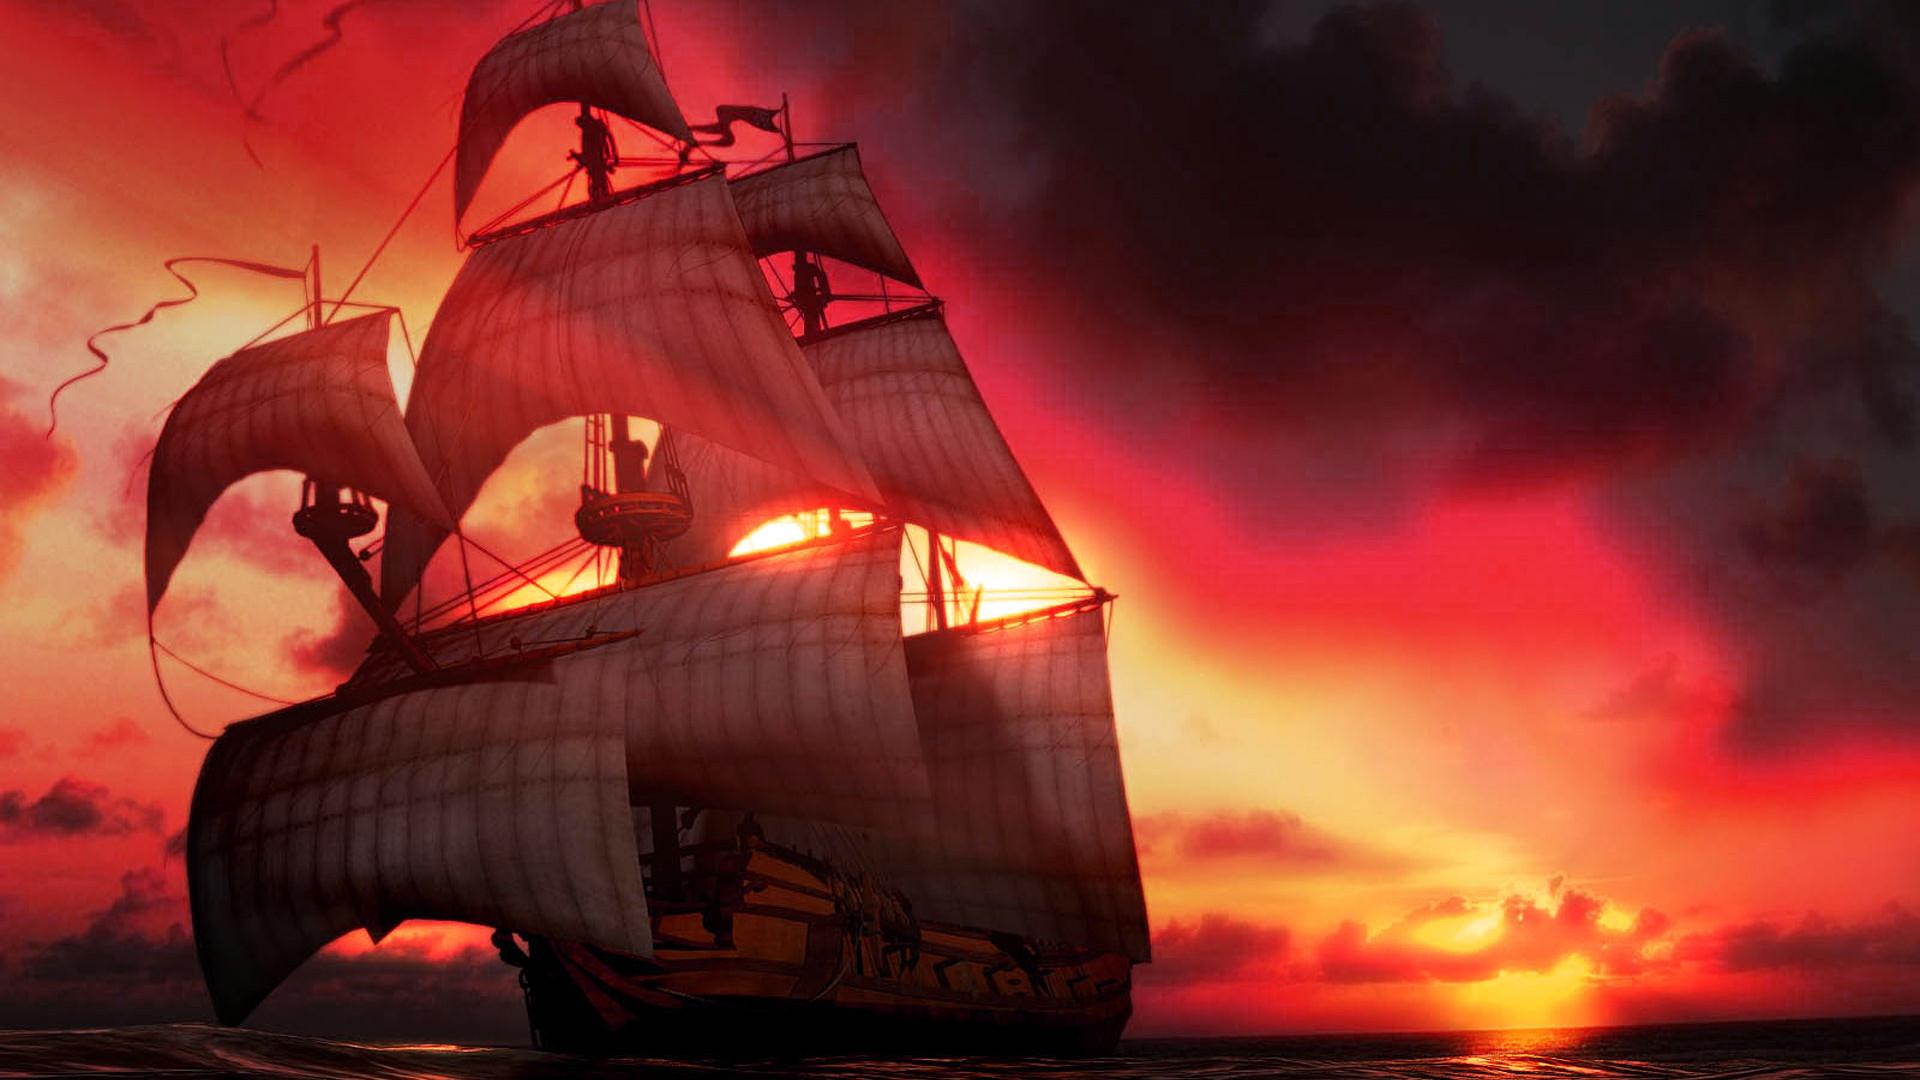 Barcos piratas wallpapers barcos piratas reales fondos hd for Wallpapers hd gratis